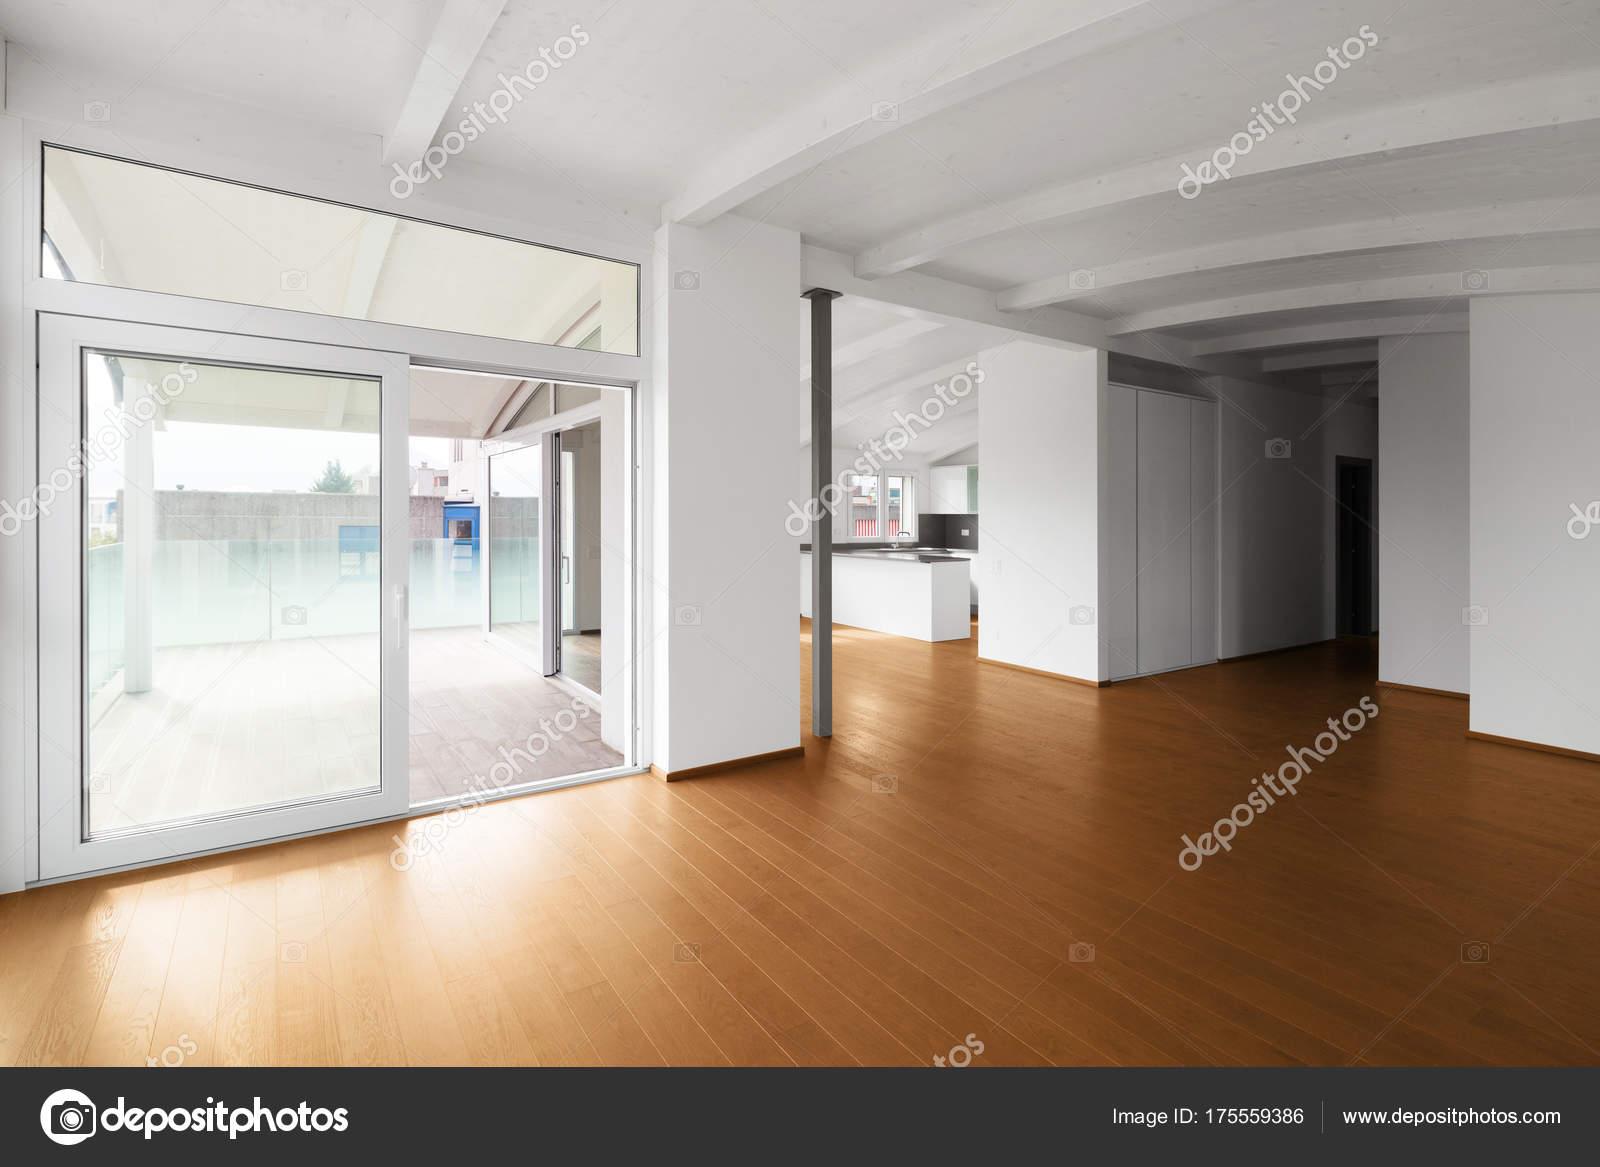 Woonkamer Op Zolder : Moderne zolder lege woonkamer u stockfoto zveiger